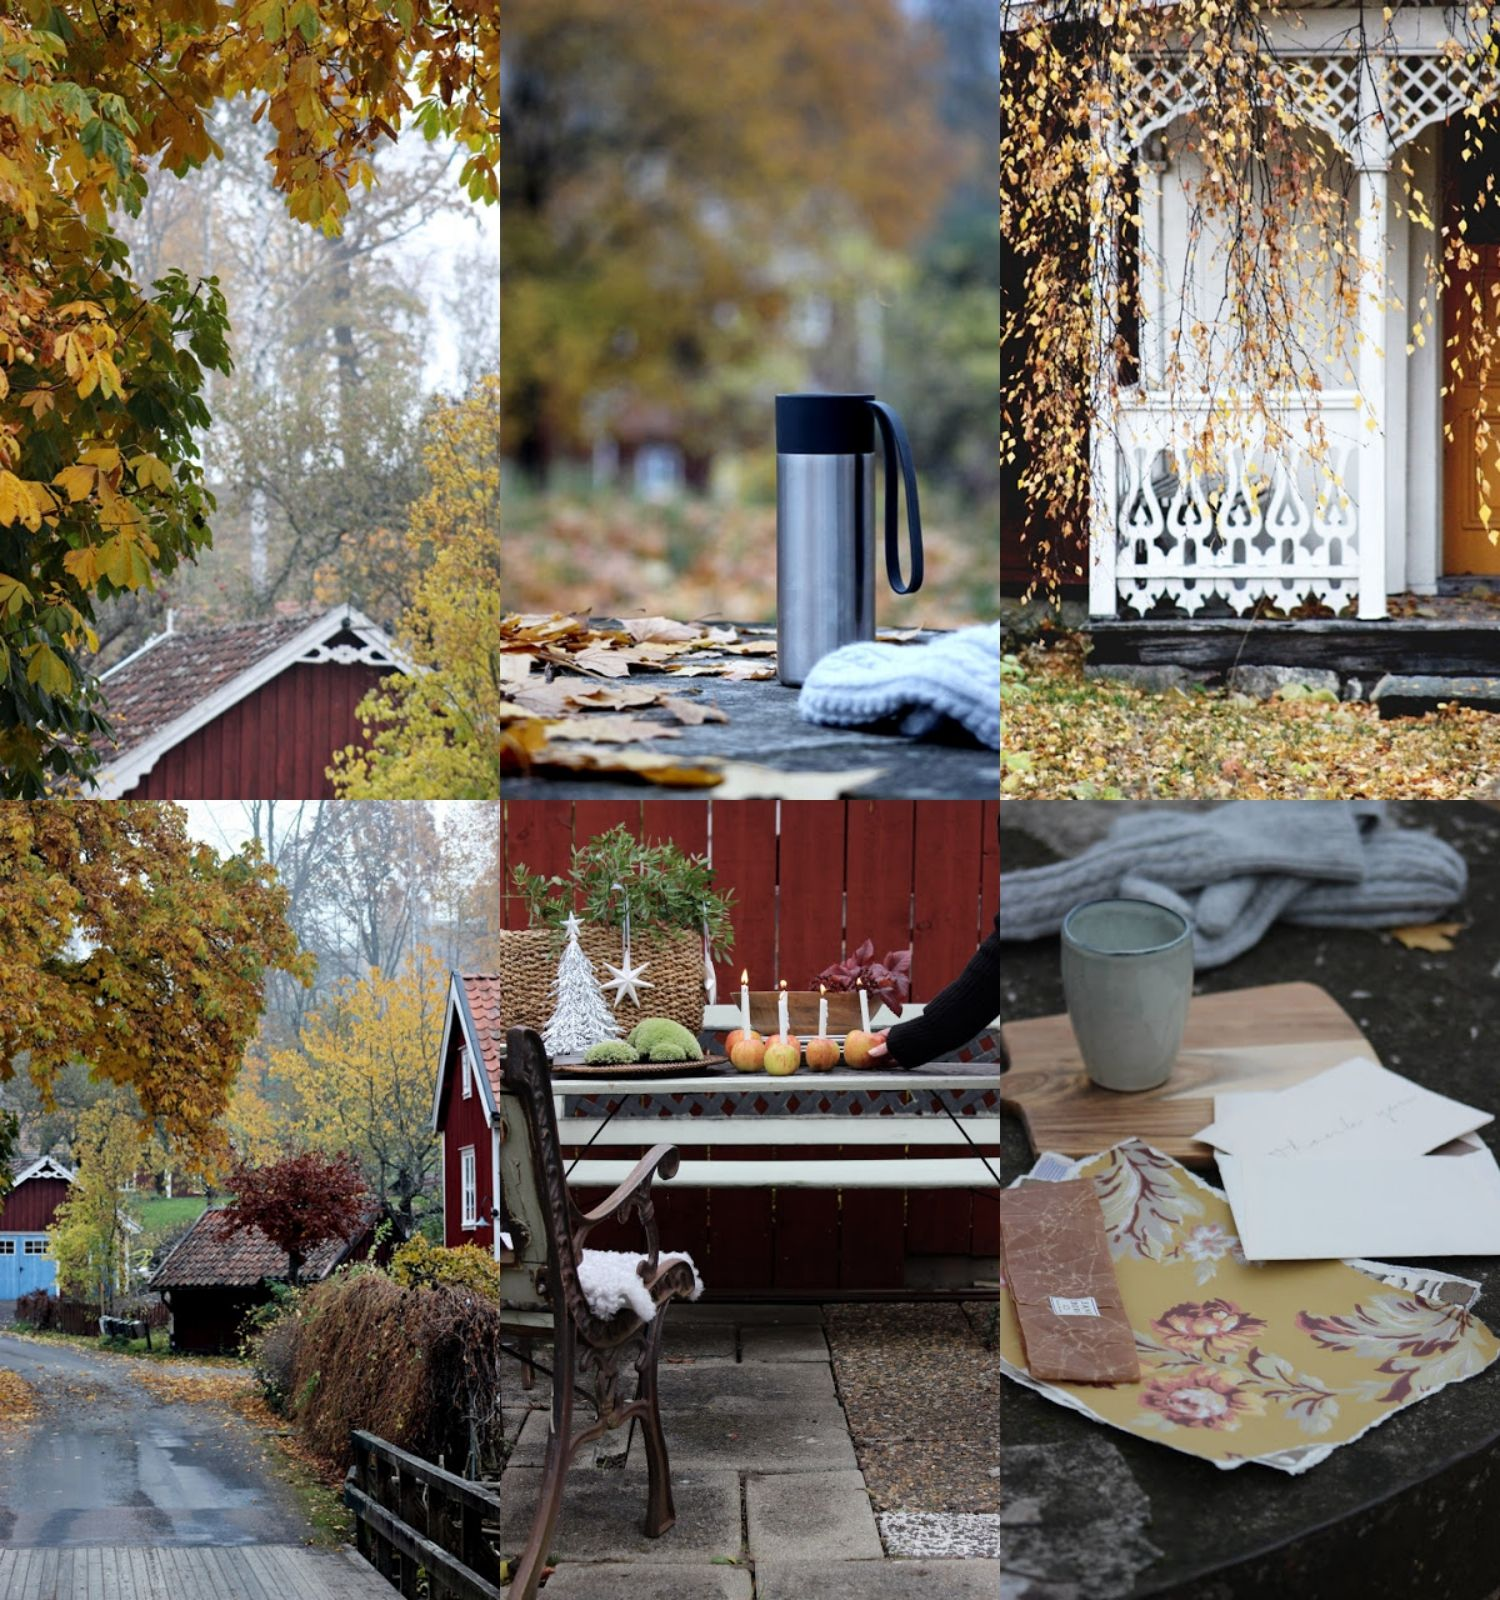 piazzan-hostbild-rottle-granna-inredningsblogg-photobypernilla-tile.JPG 1500 × 1600 pixlar